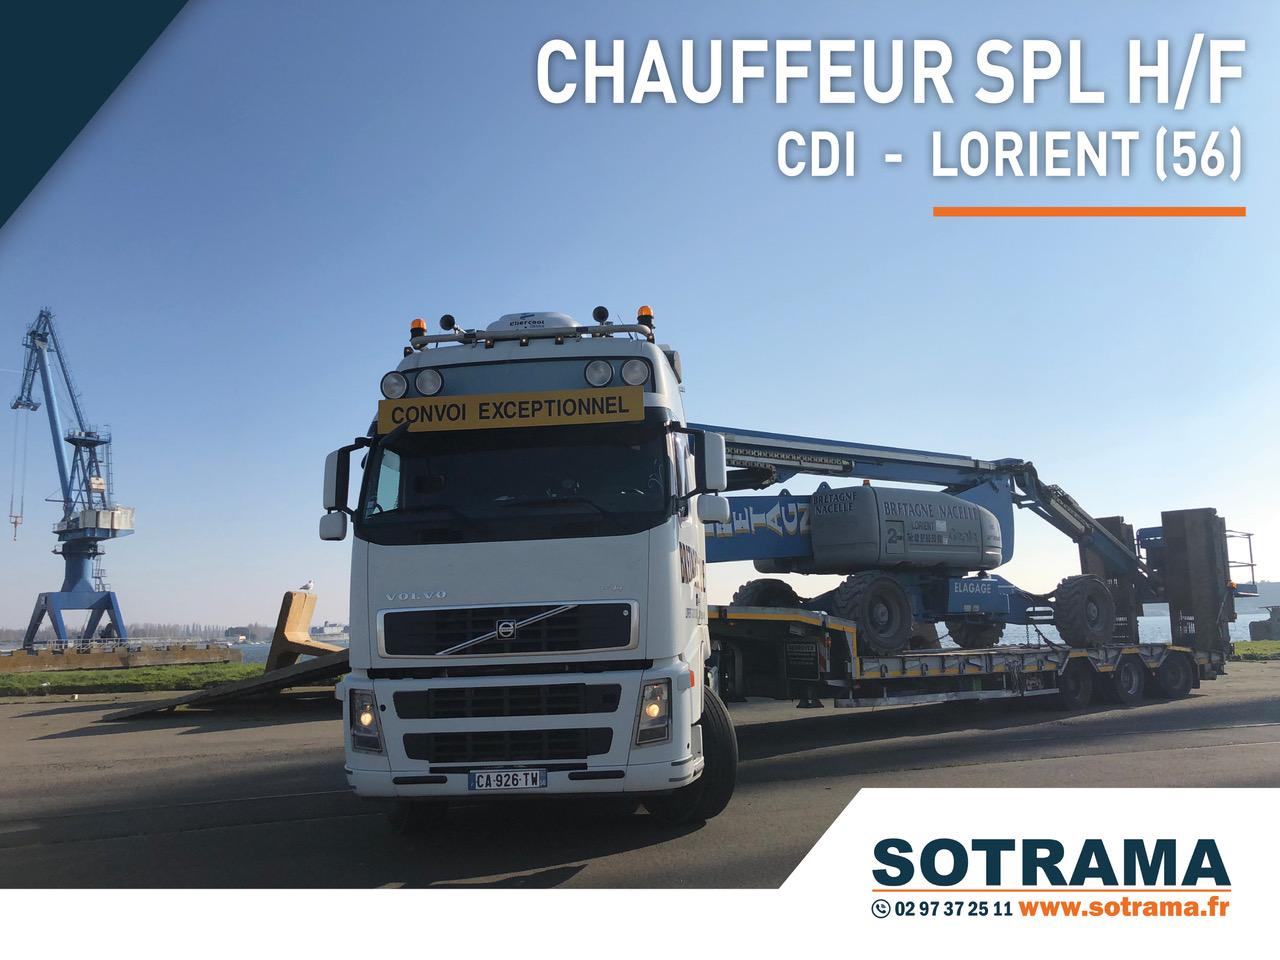 Offre emploi CDD CDI lorient chauffeur poids lourd recrutement embauche contrat Lorient